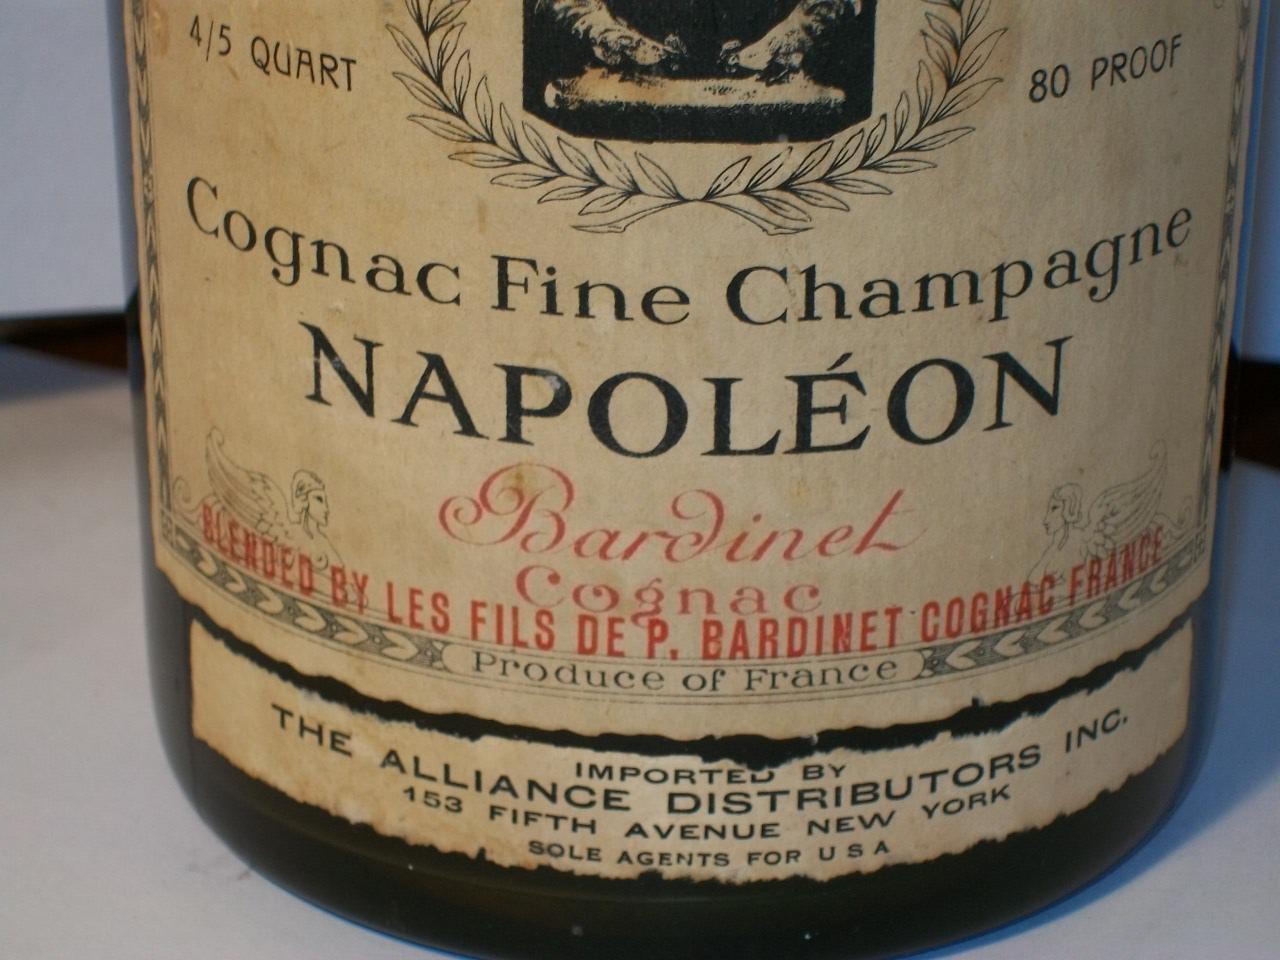 Bardinet Cognac Napoleon